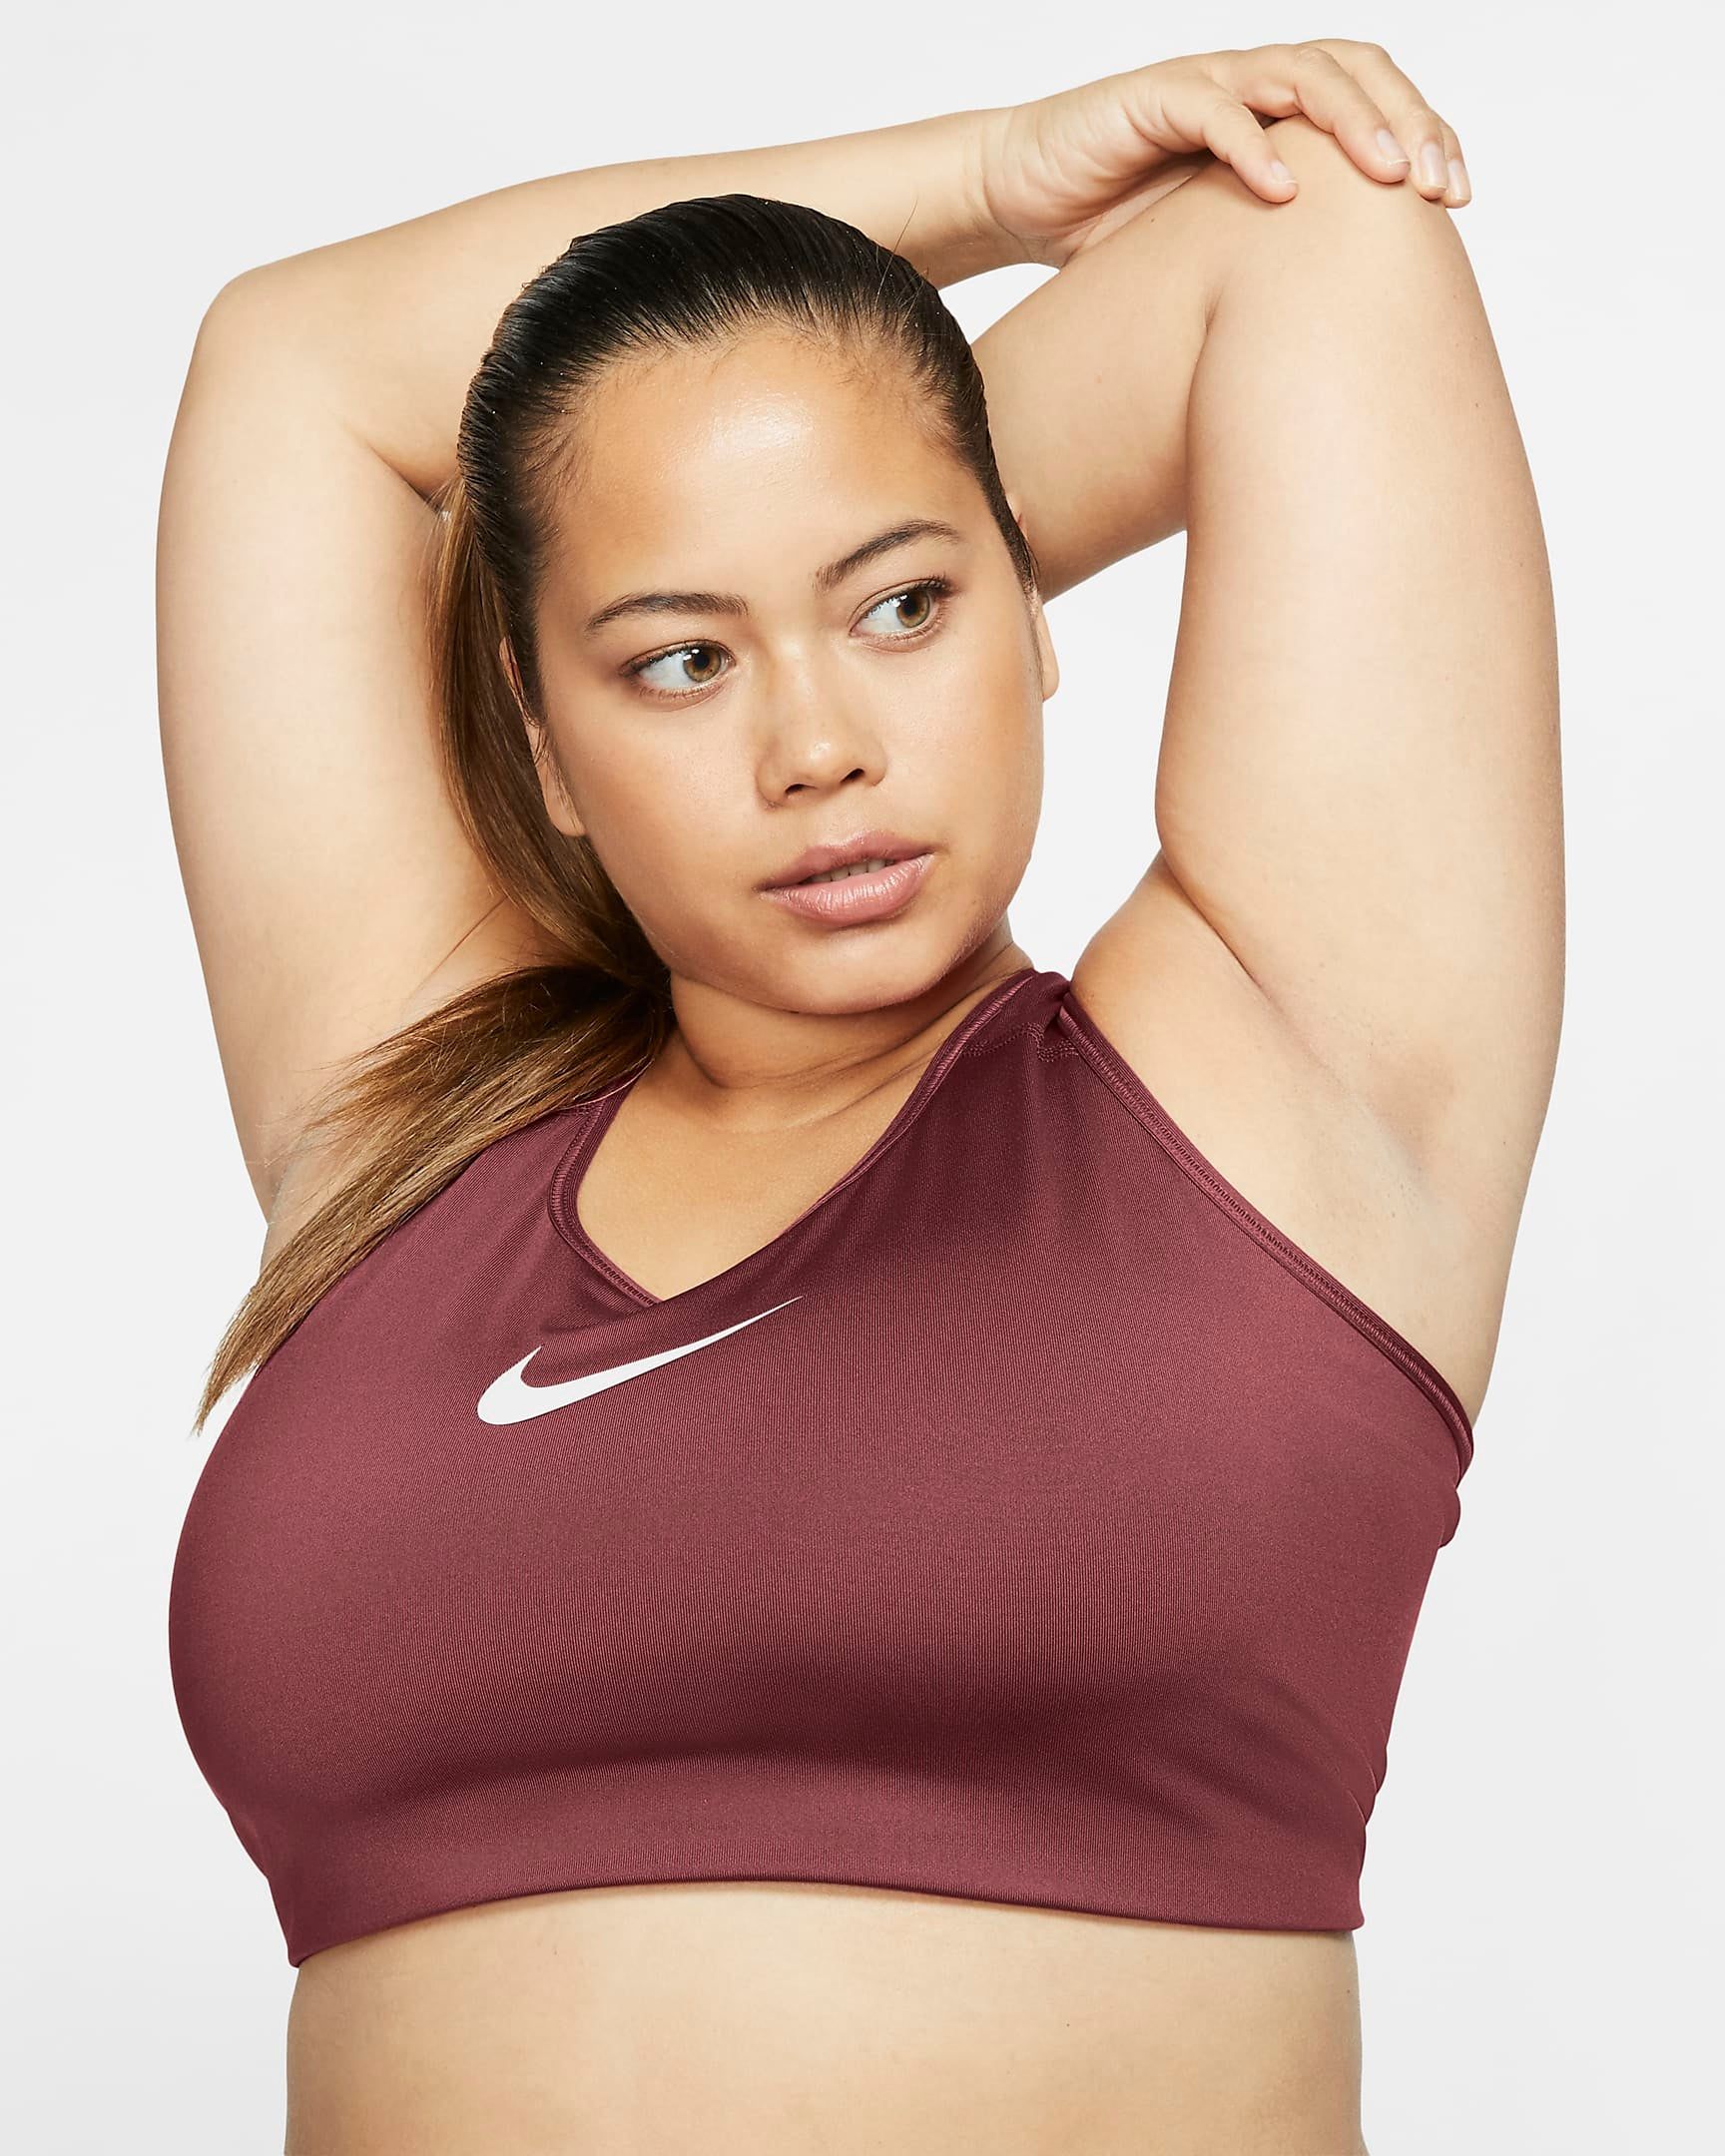 model wears berry-tone Nike medium-support sports bra